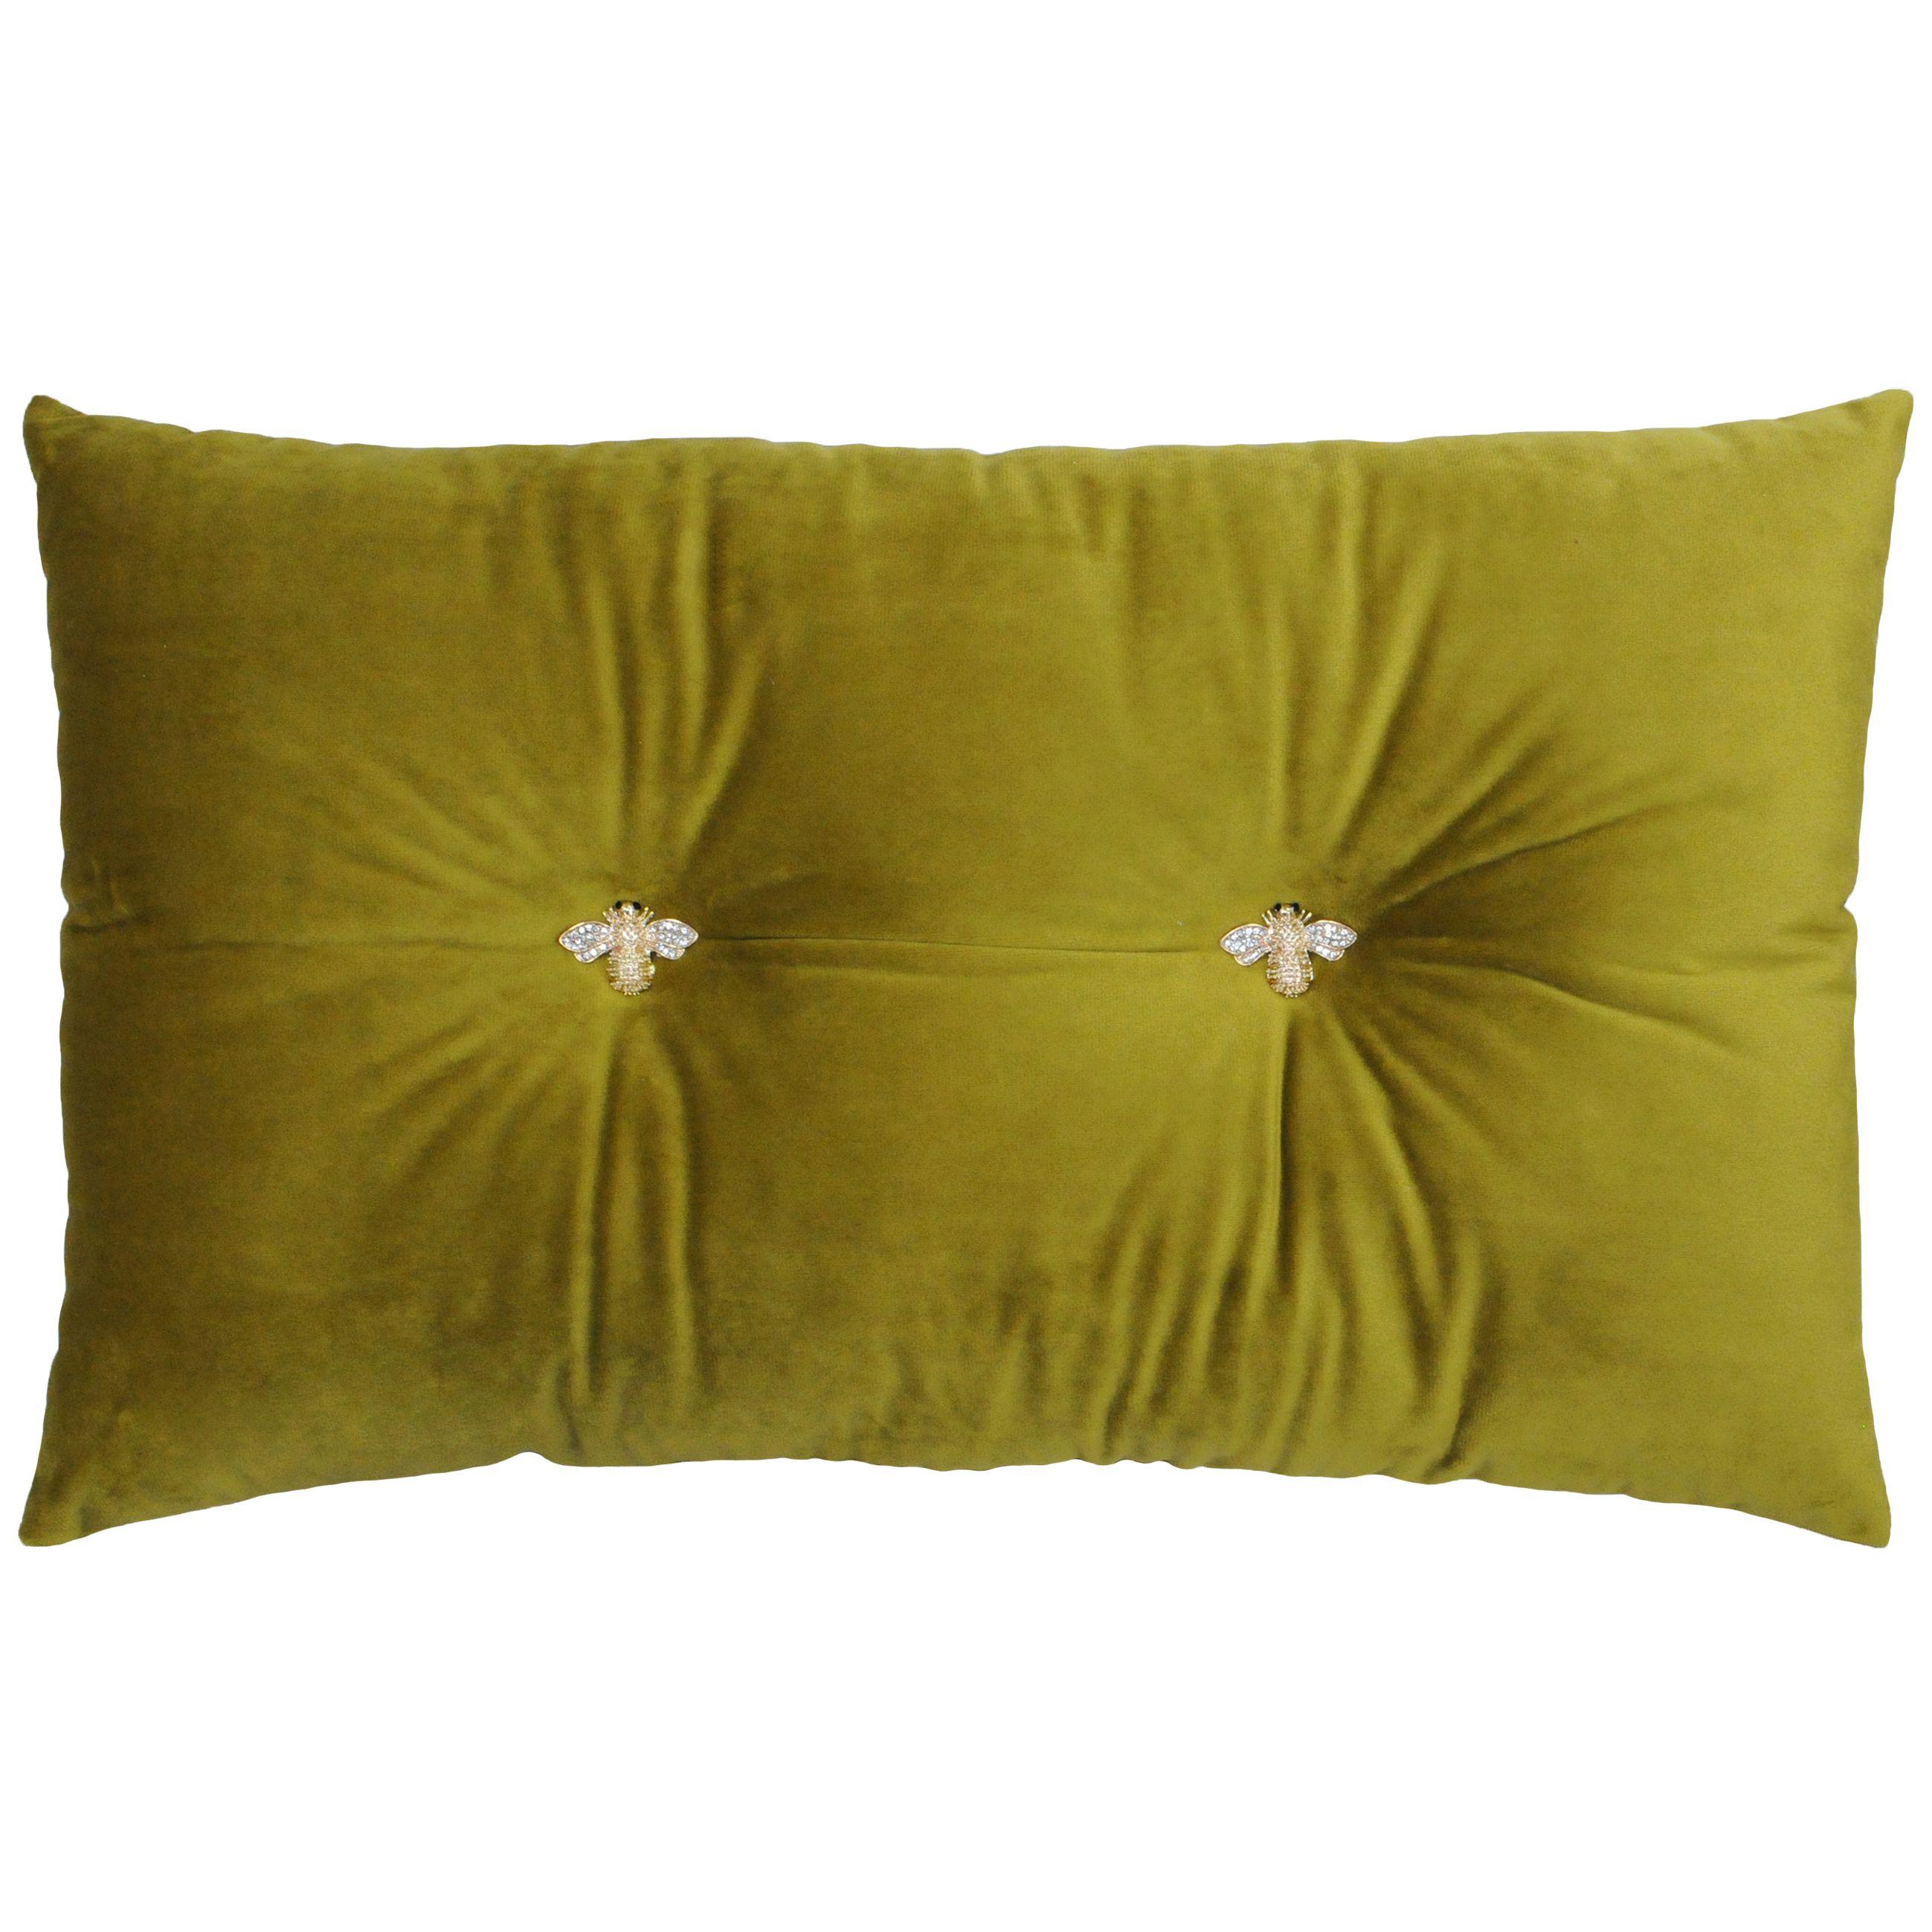 Bumble 30X50 Pf/Cushion Olive